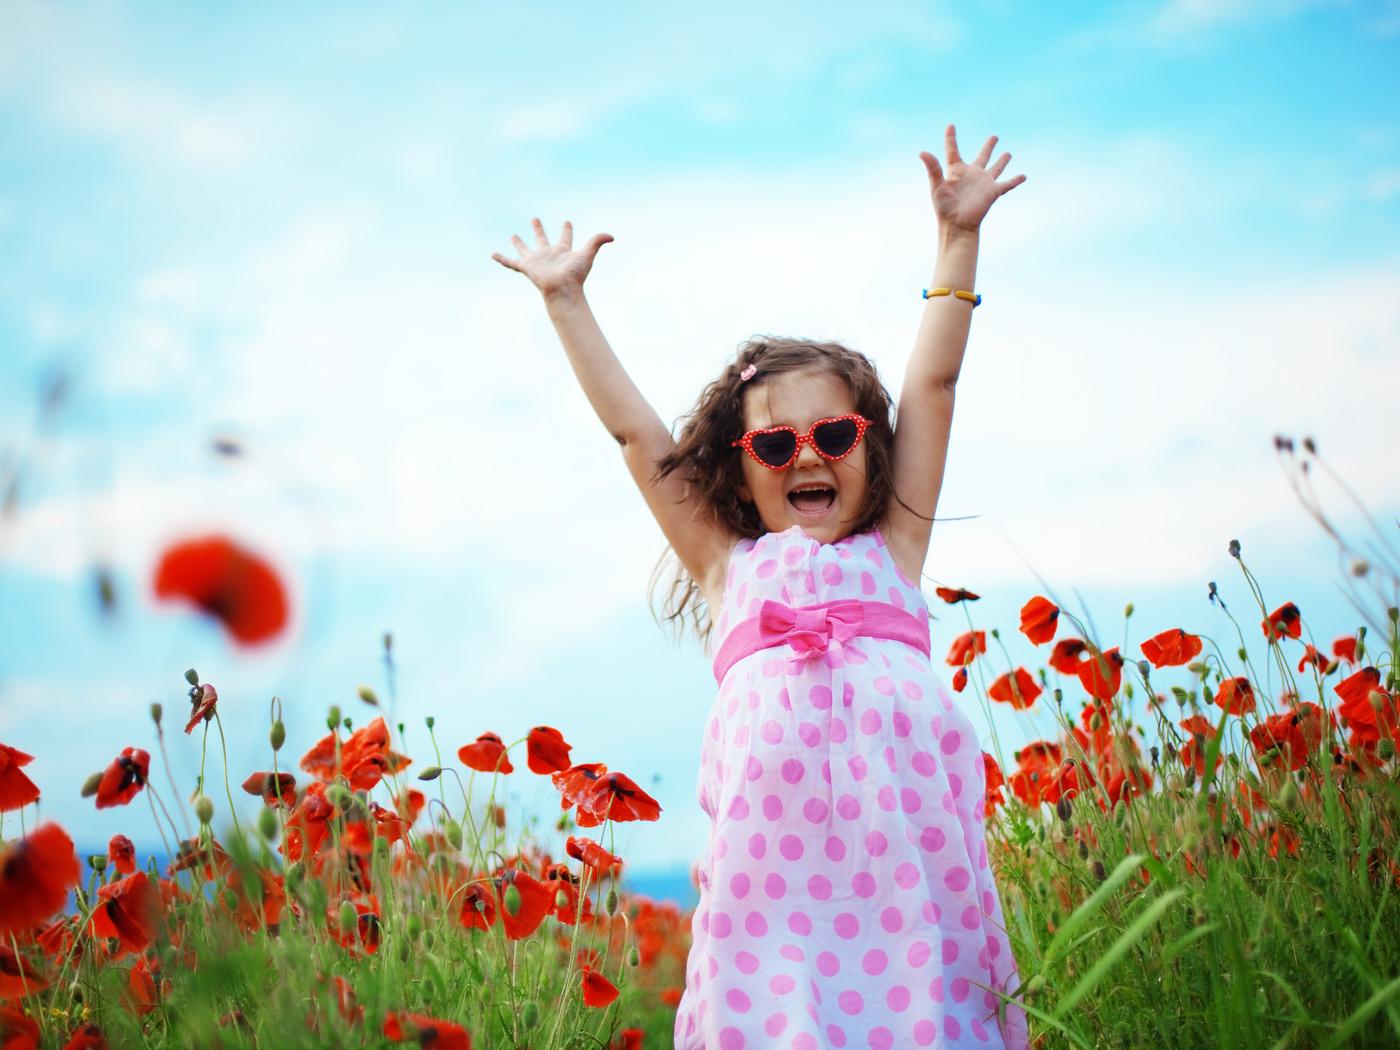 Развиваем грамматический строй речи ребенка